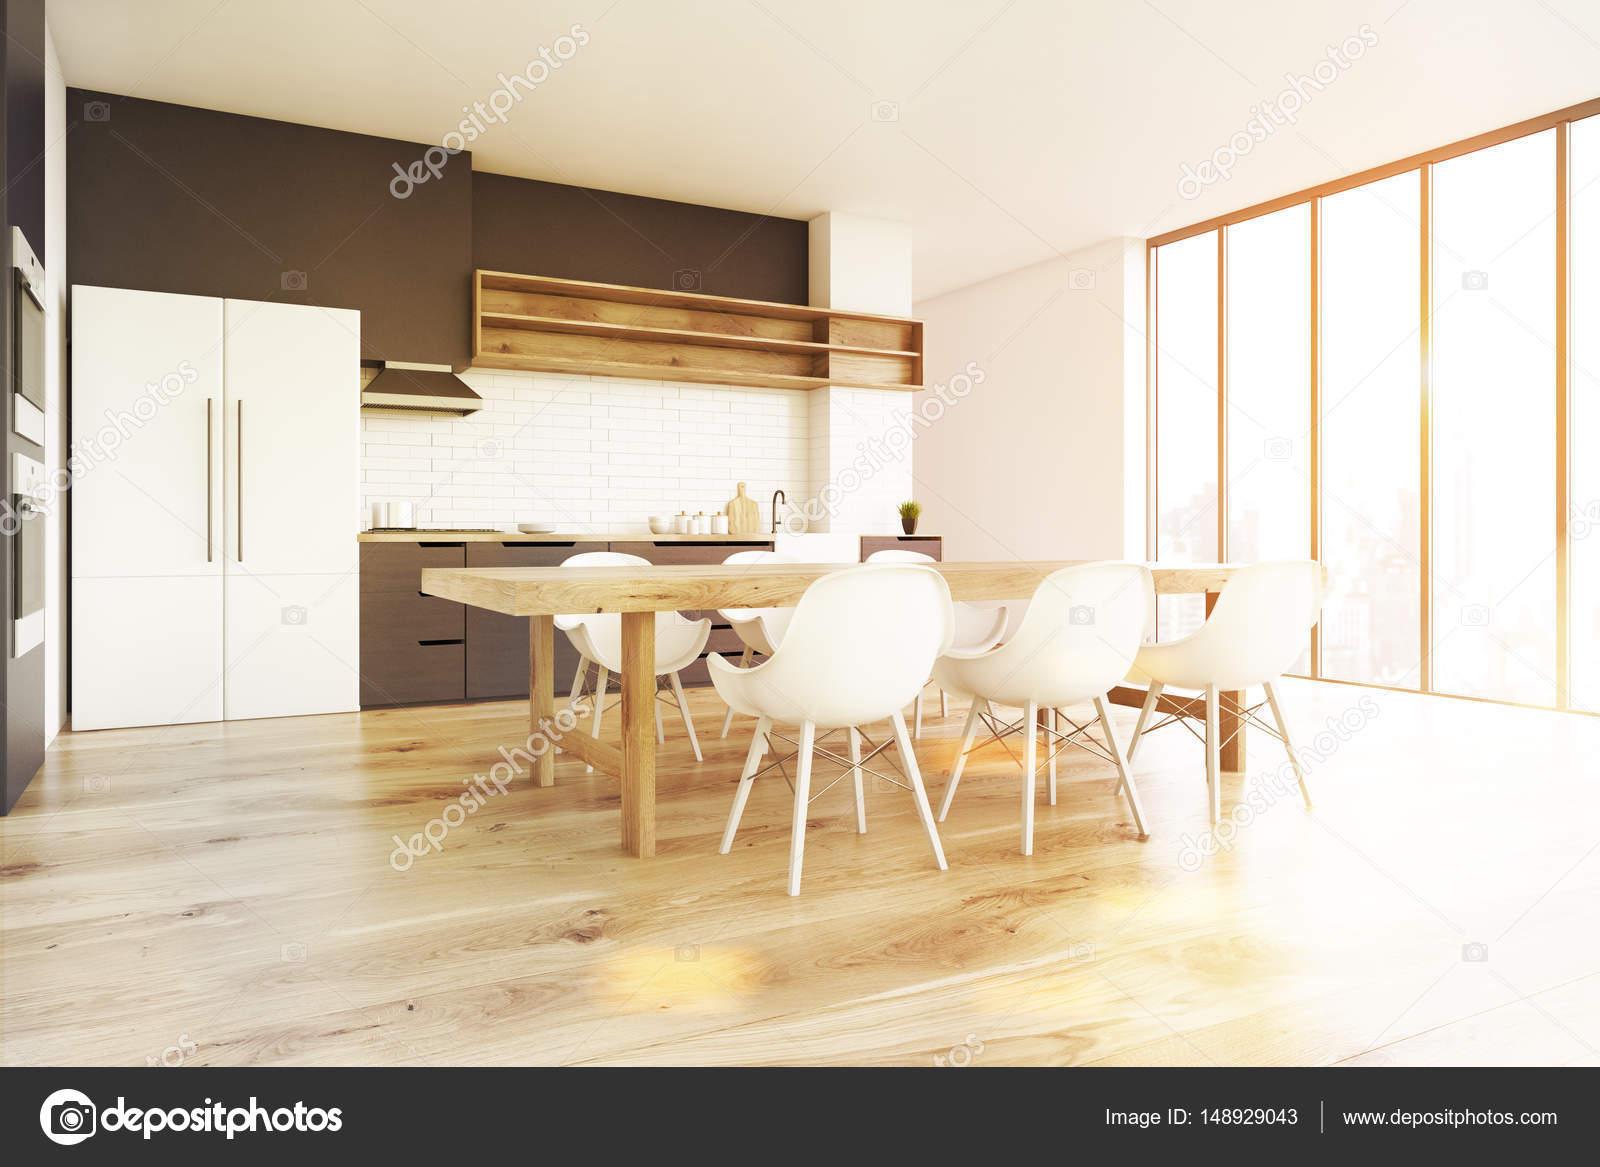 Holzfußboden In Küche ~ Holzboden küche side getönt u stockfoto denisismagilov